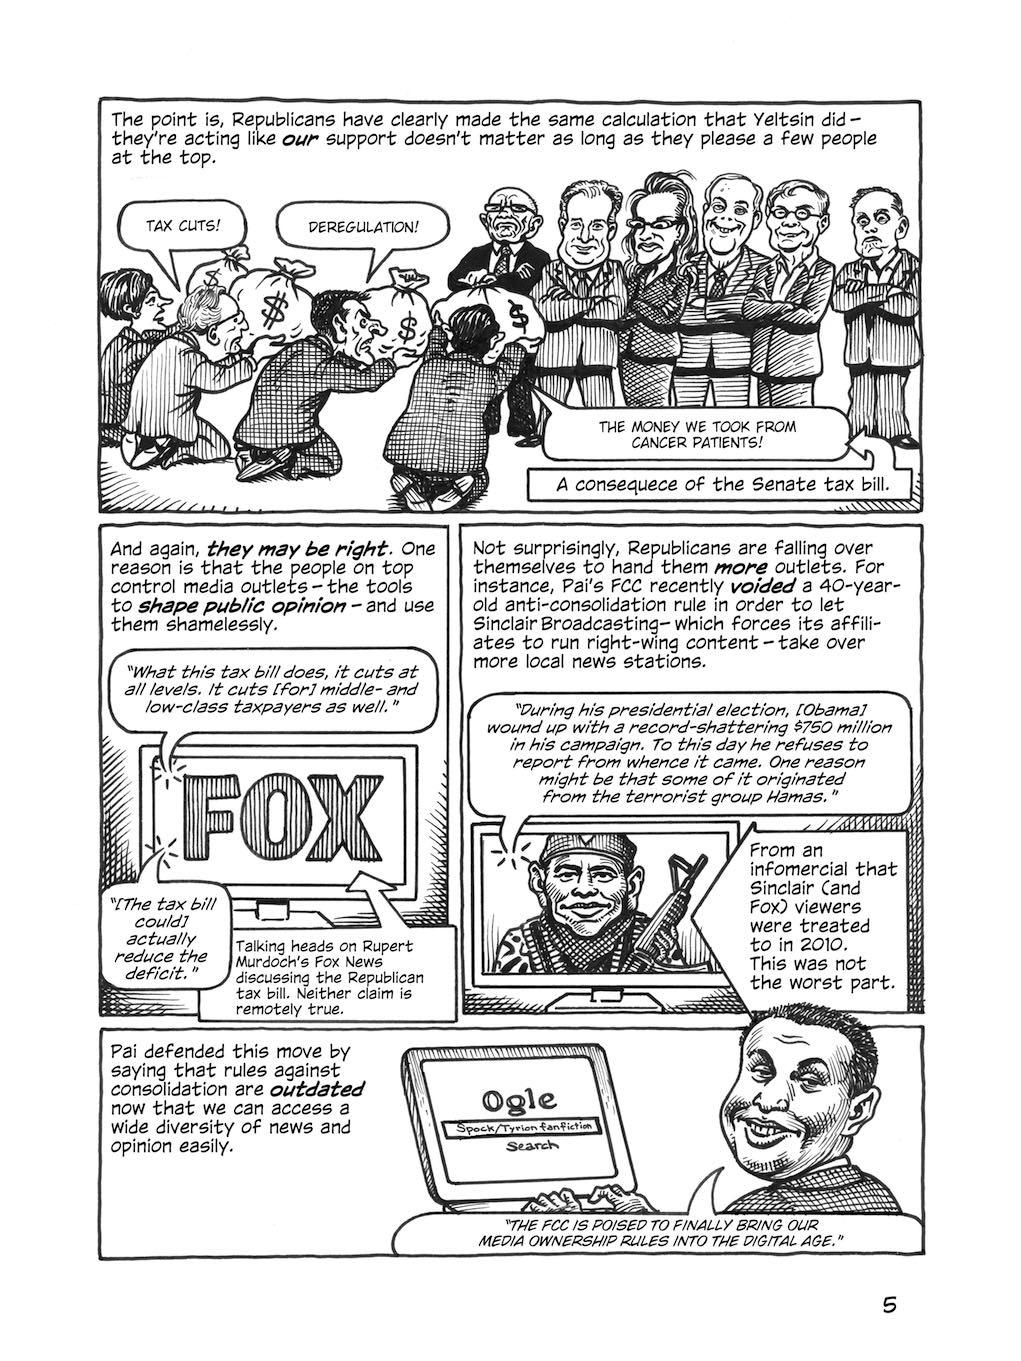 Net Neutrality 2 pg 5